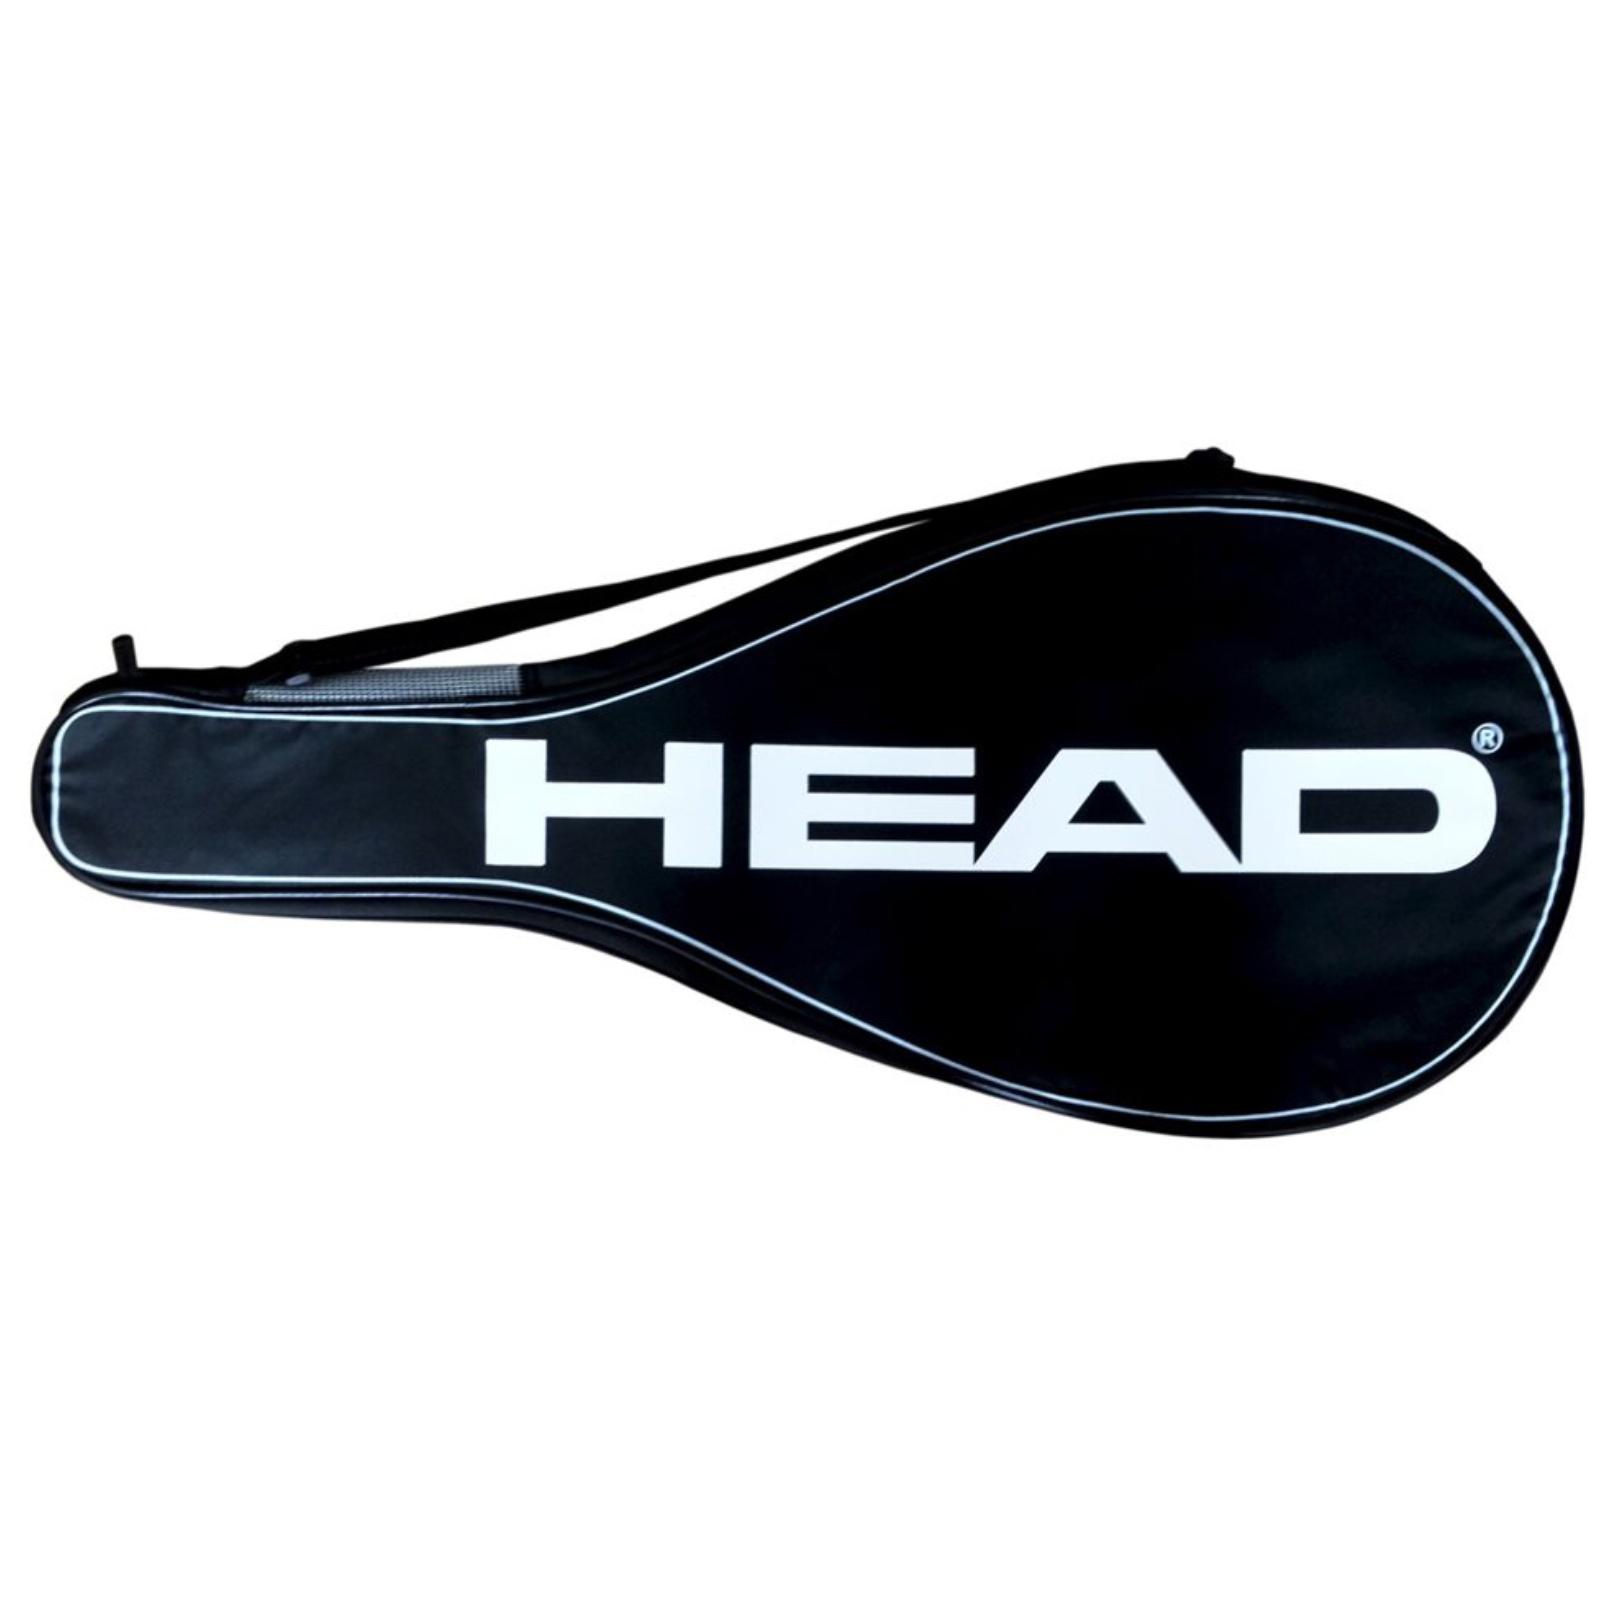 Obal na tenisovou raketu HEAD